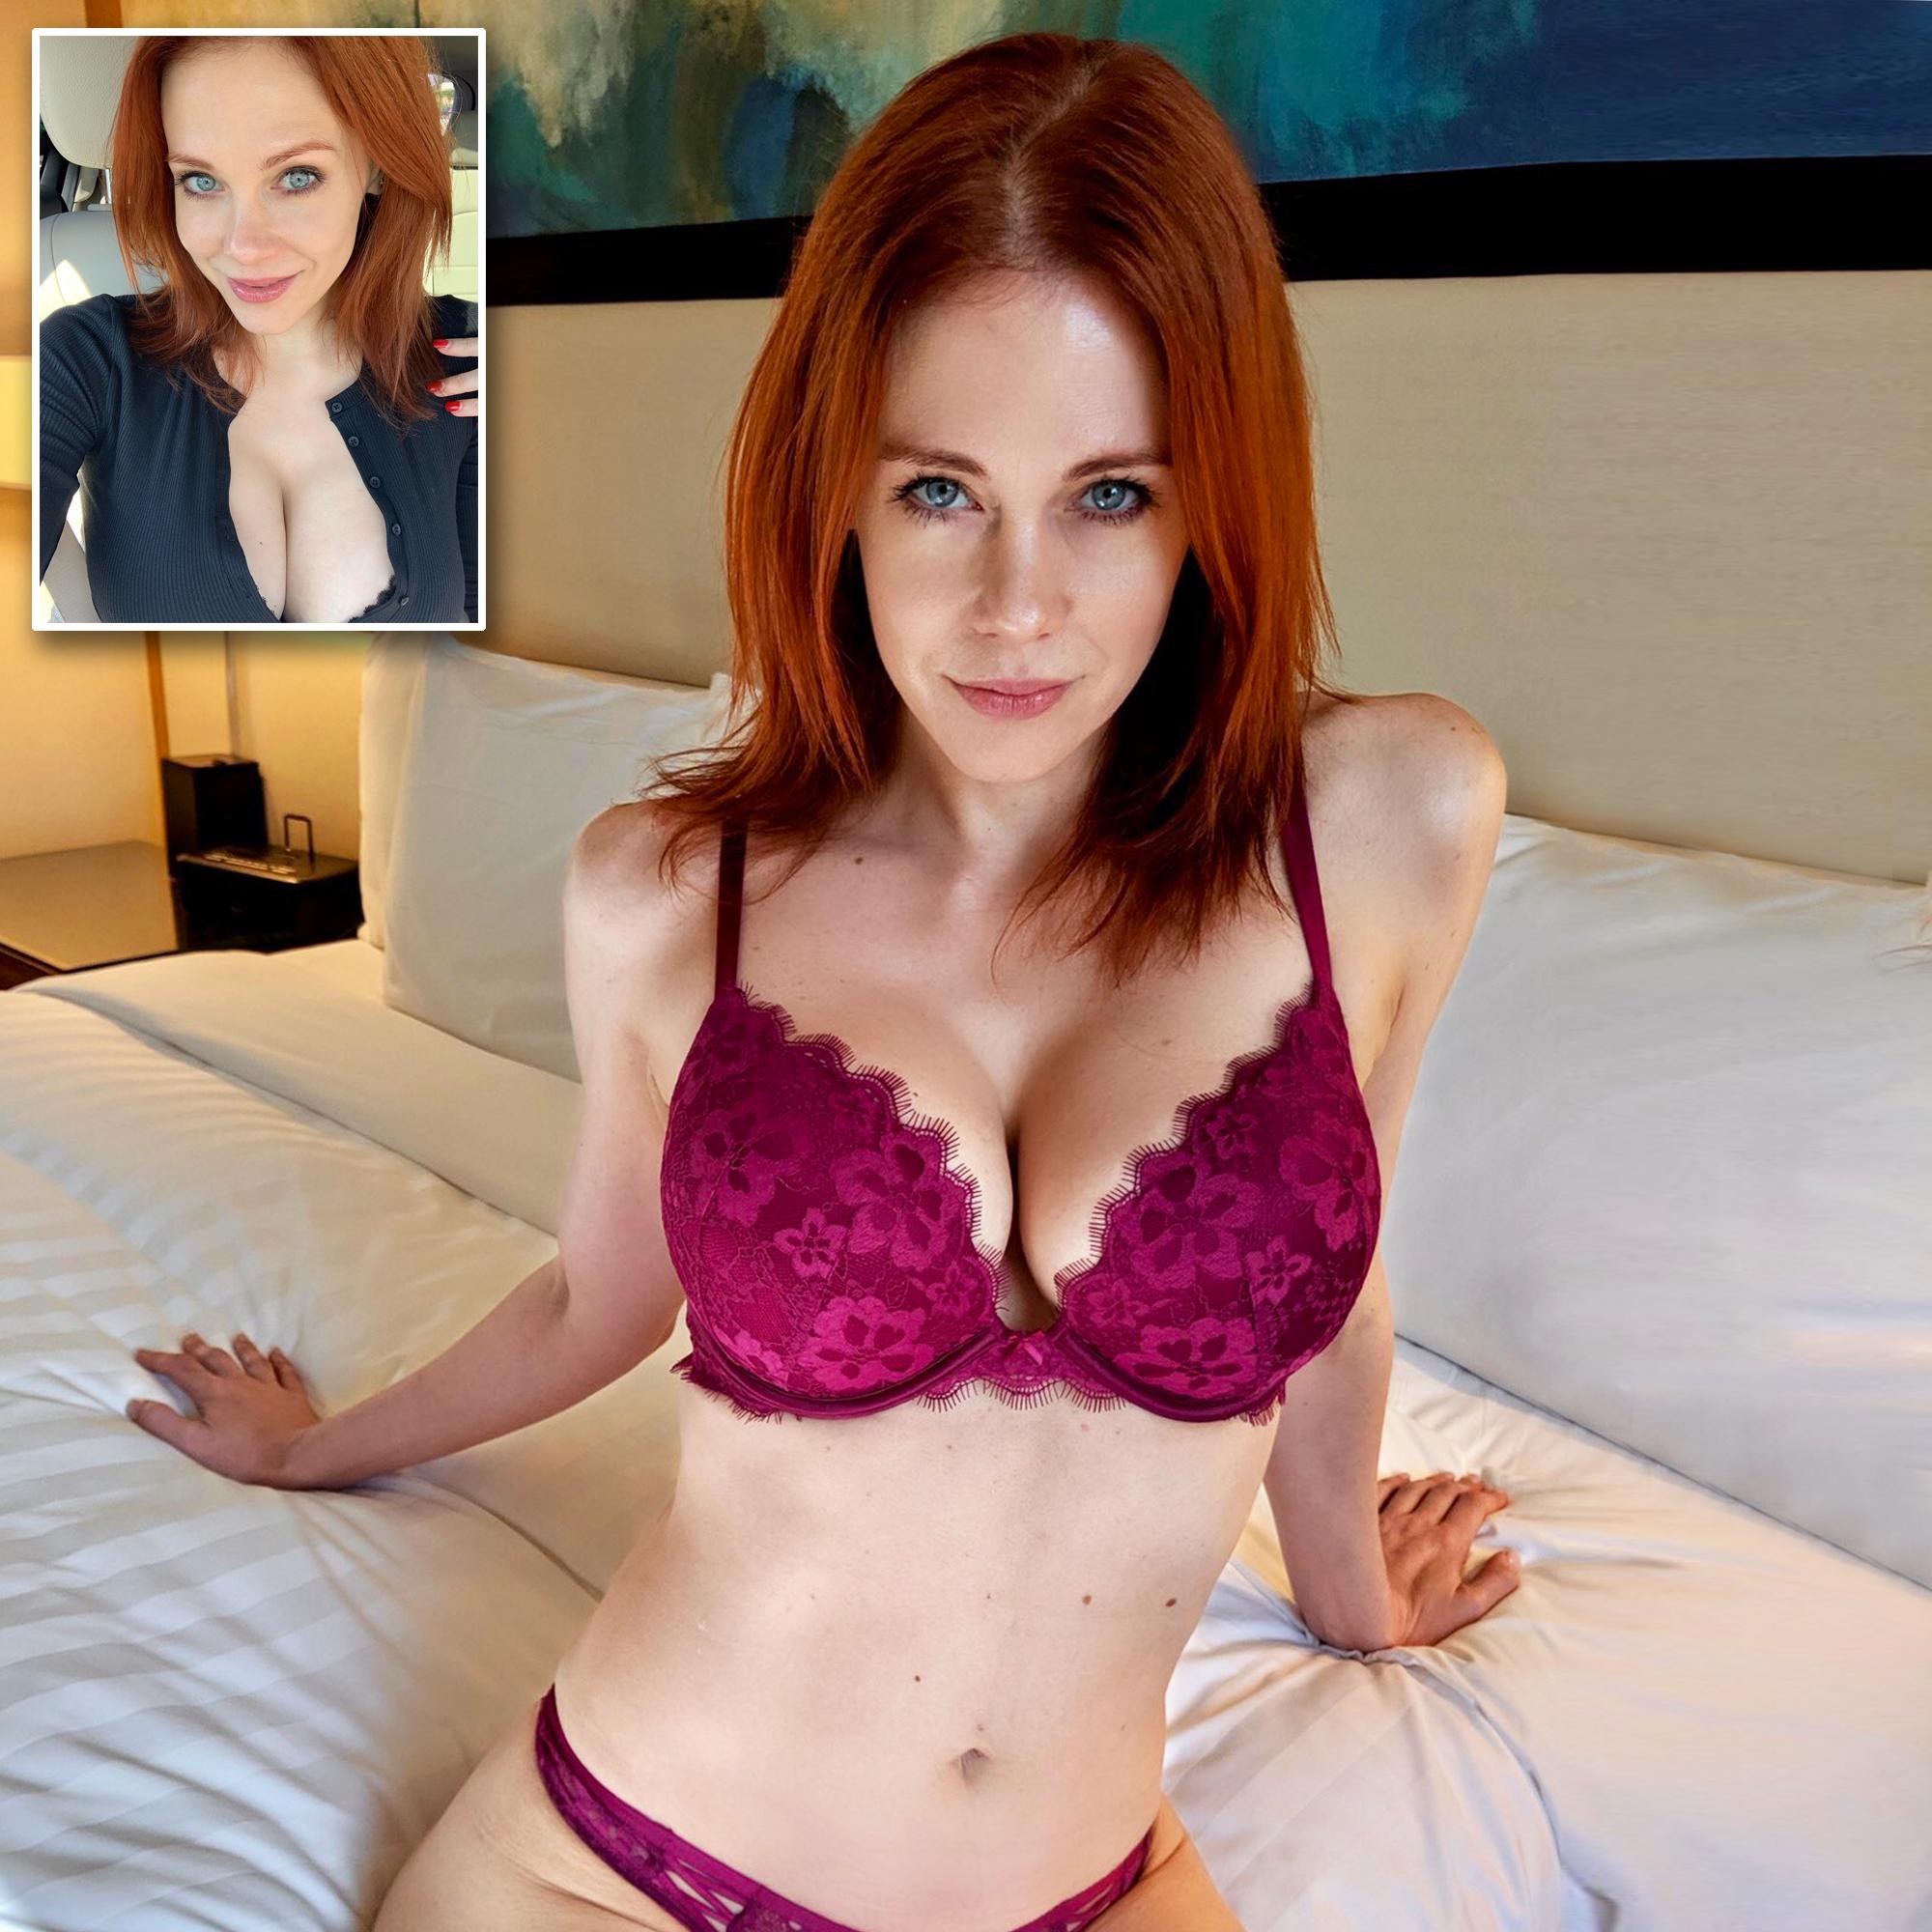 Amy Davidson Sexy Pics boy meets world' star maitland ward's sexiest moments: photos